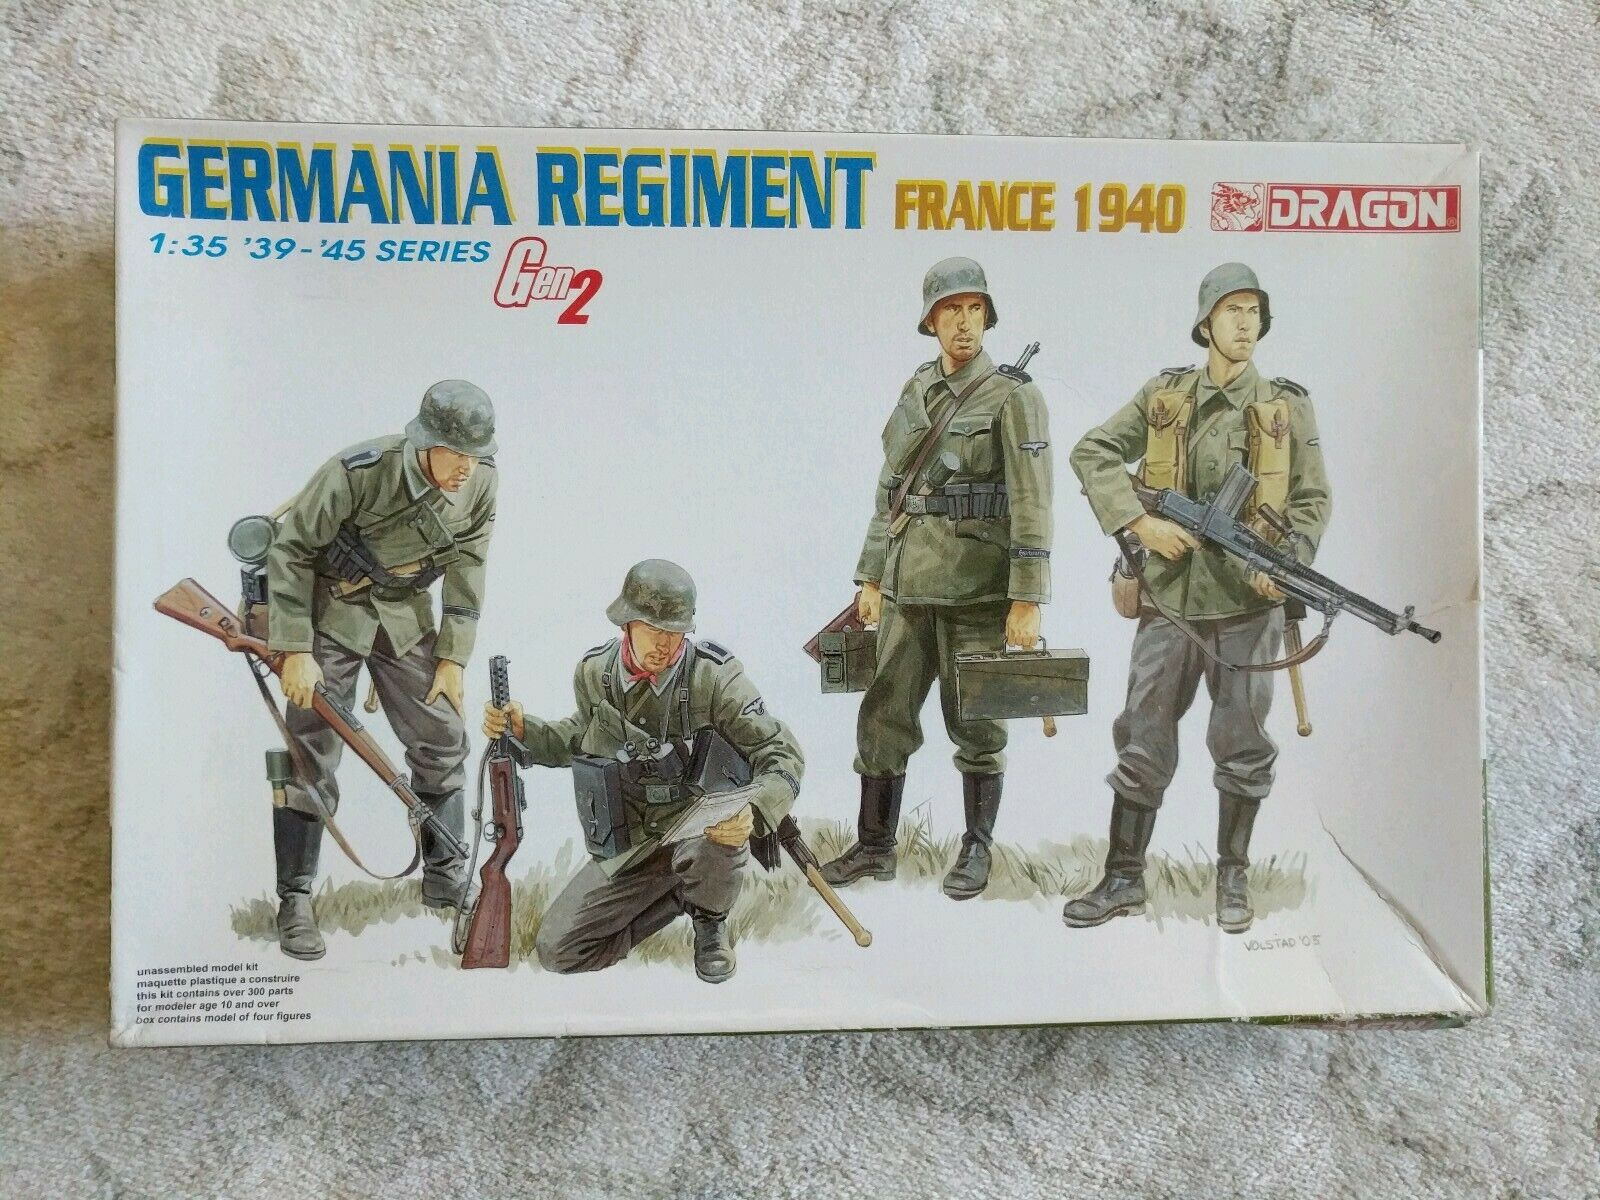 DRAGON GERMANIA REGIMENT FRANCE 1940 1//35 Kits Soldiers 4 figures model